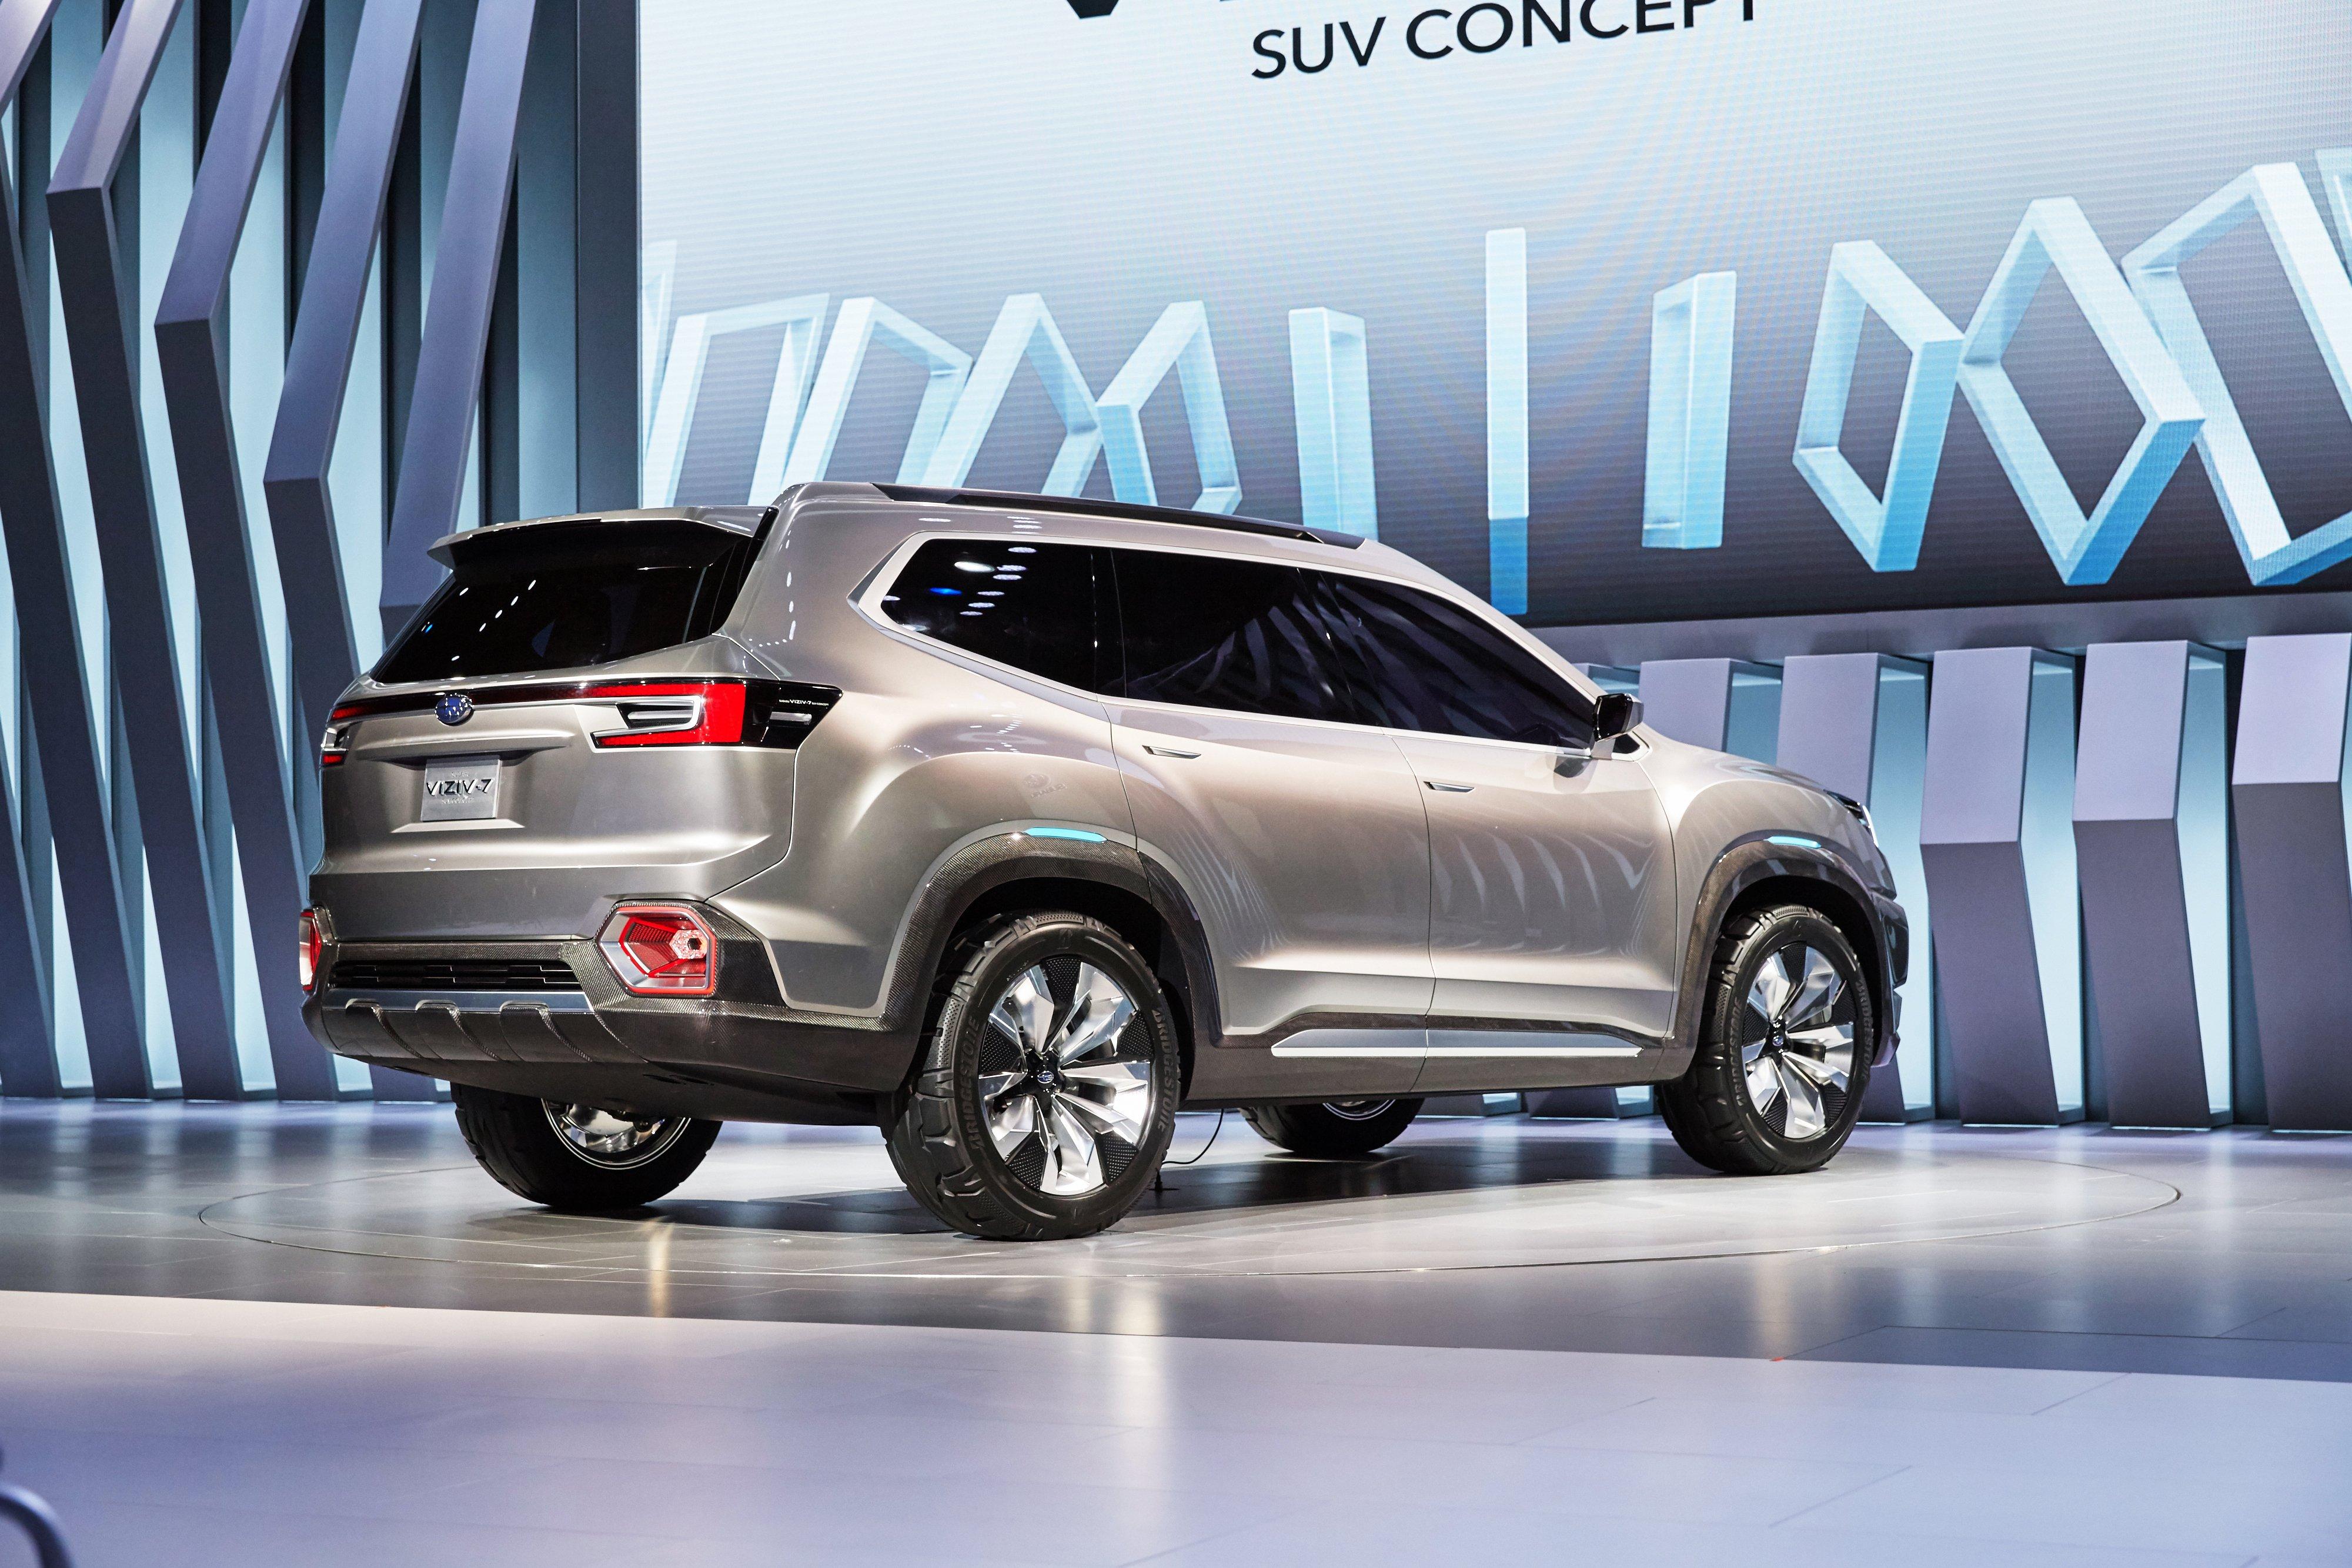 Subaru Suv 2017 >> Subaru Viziv-7 Concept debuts – seven-seater SUV Image 581352